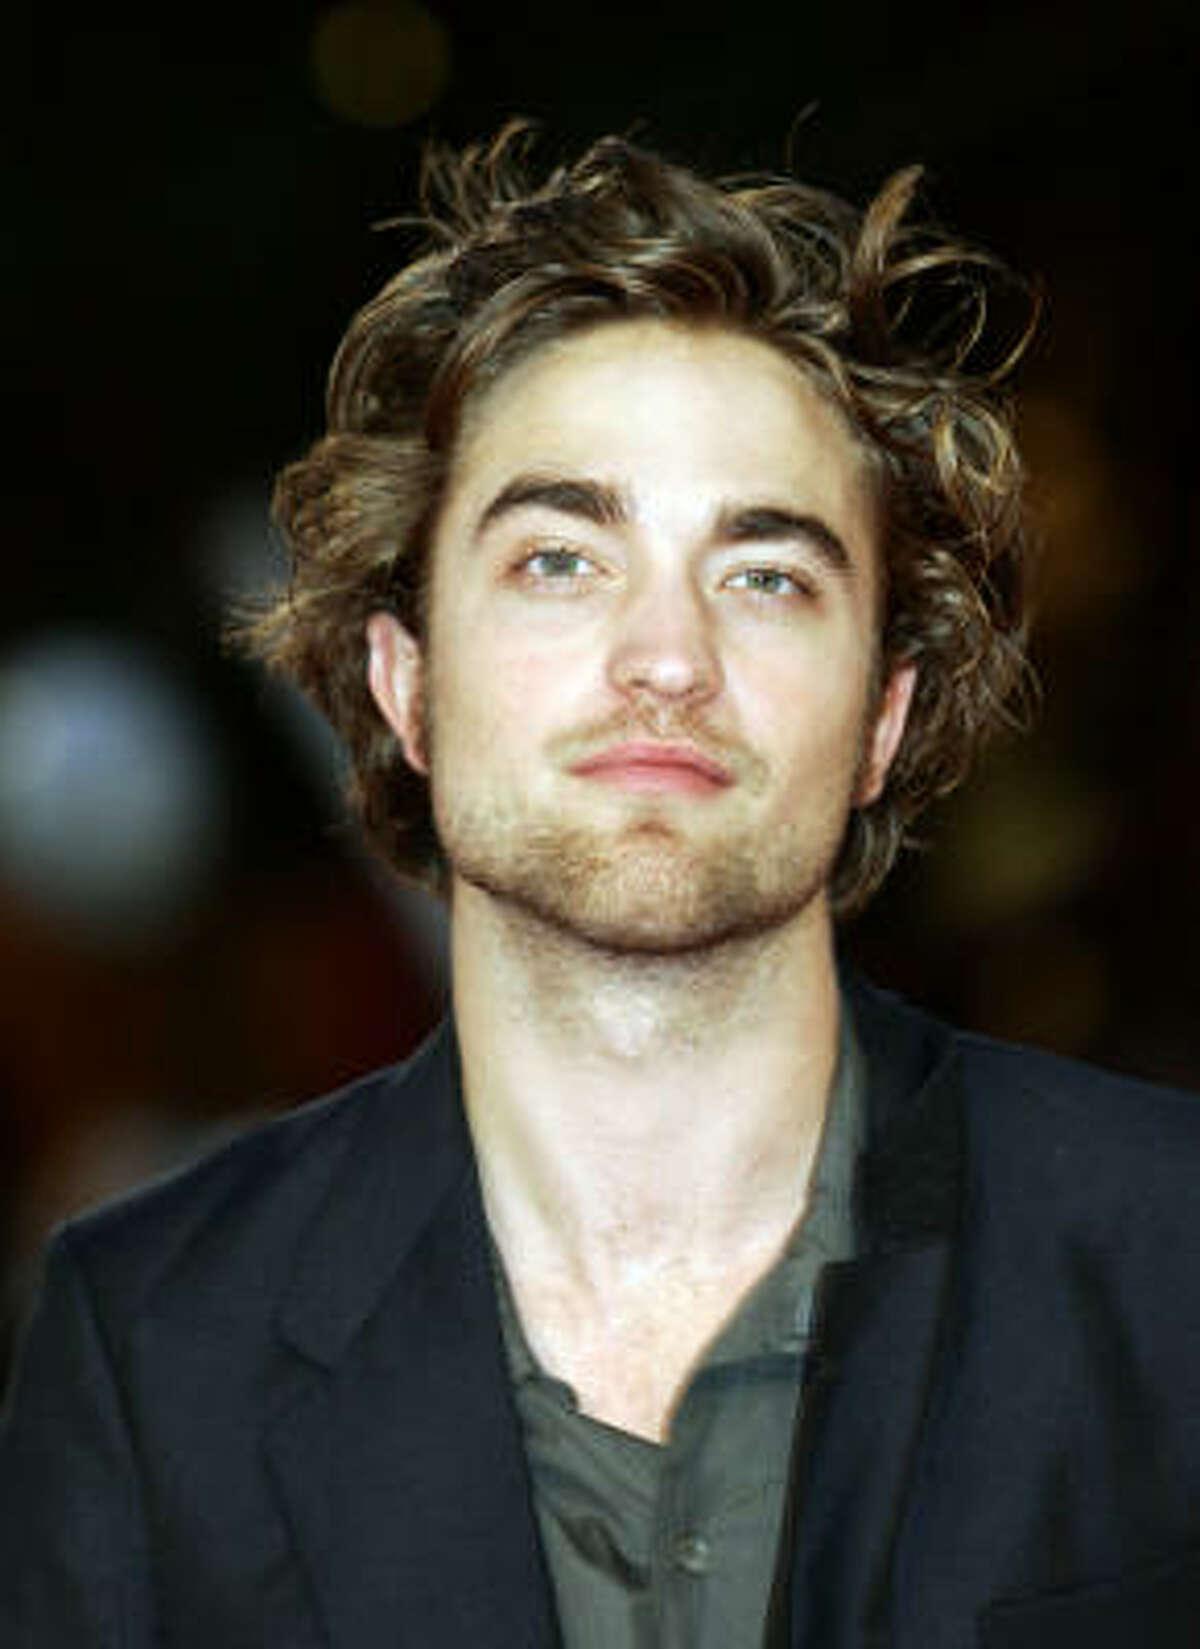 Robert Pattinson as Edward Cullen in Twilight.